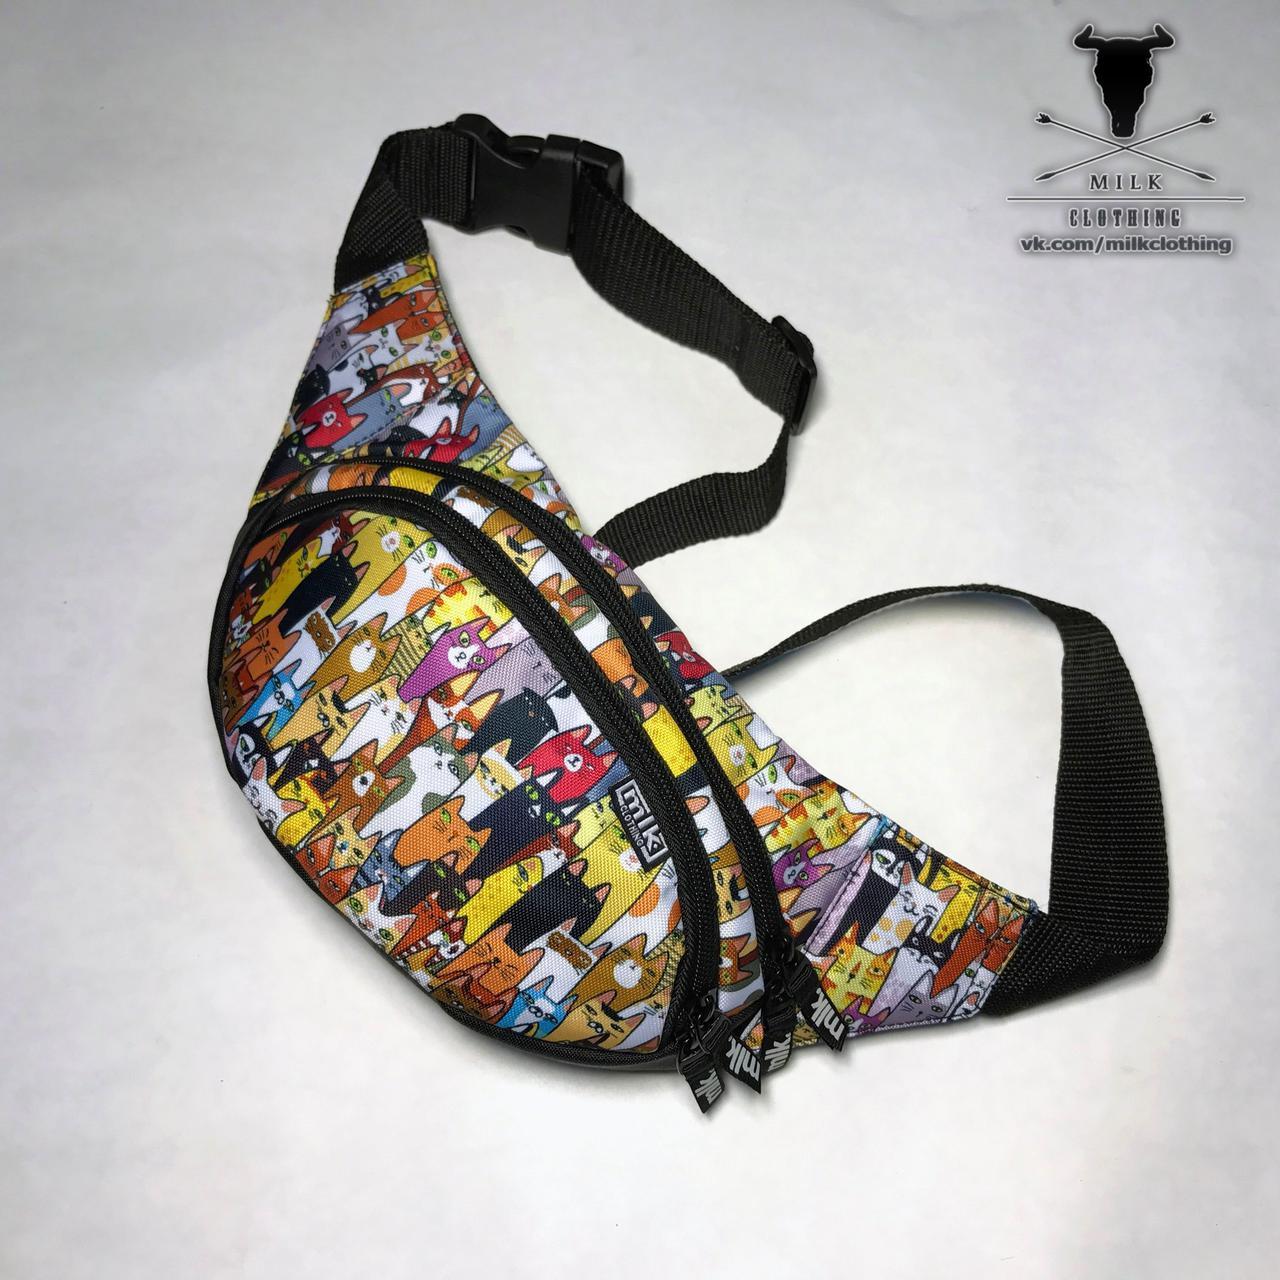 d673b713e4bd Красивая поясная сумка бананка Milk flamingo заказ, цены в Украине ...